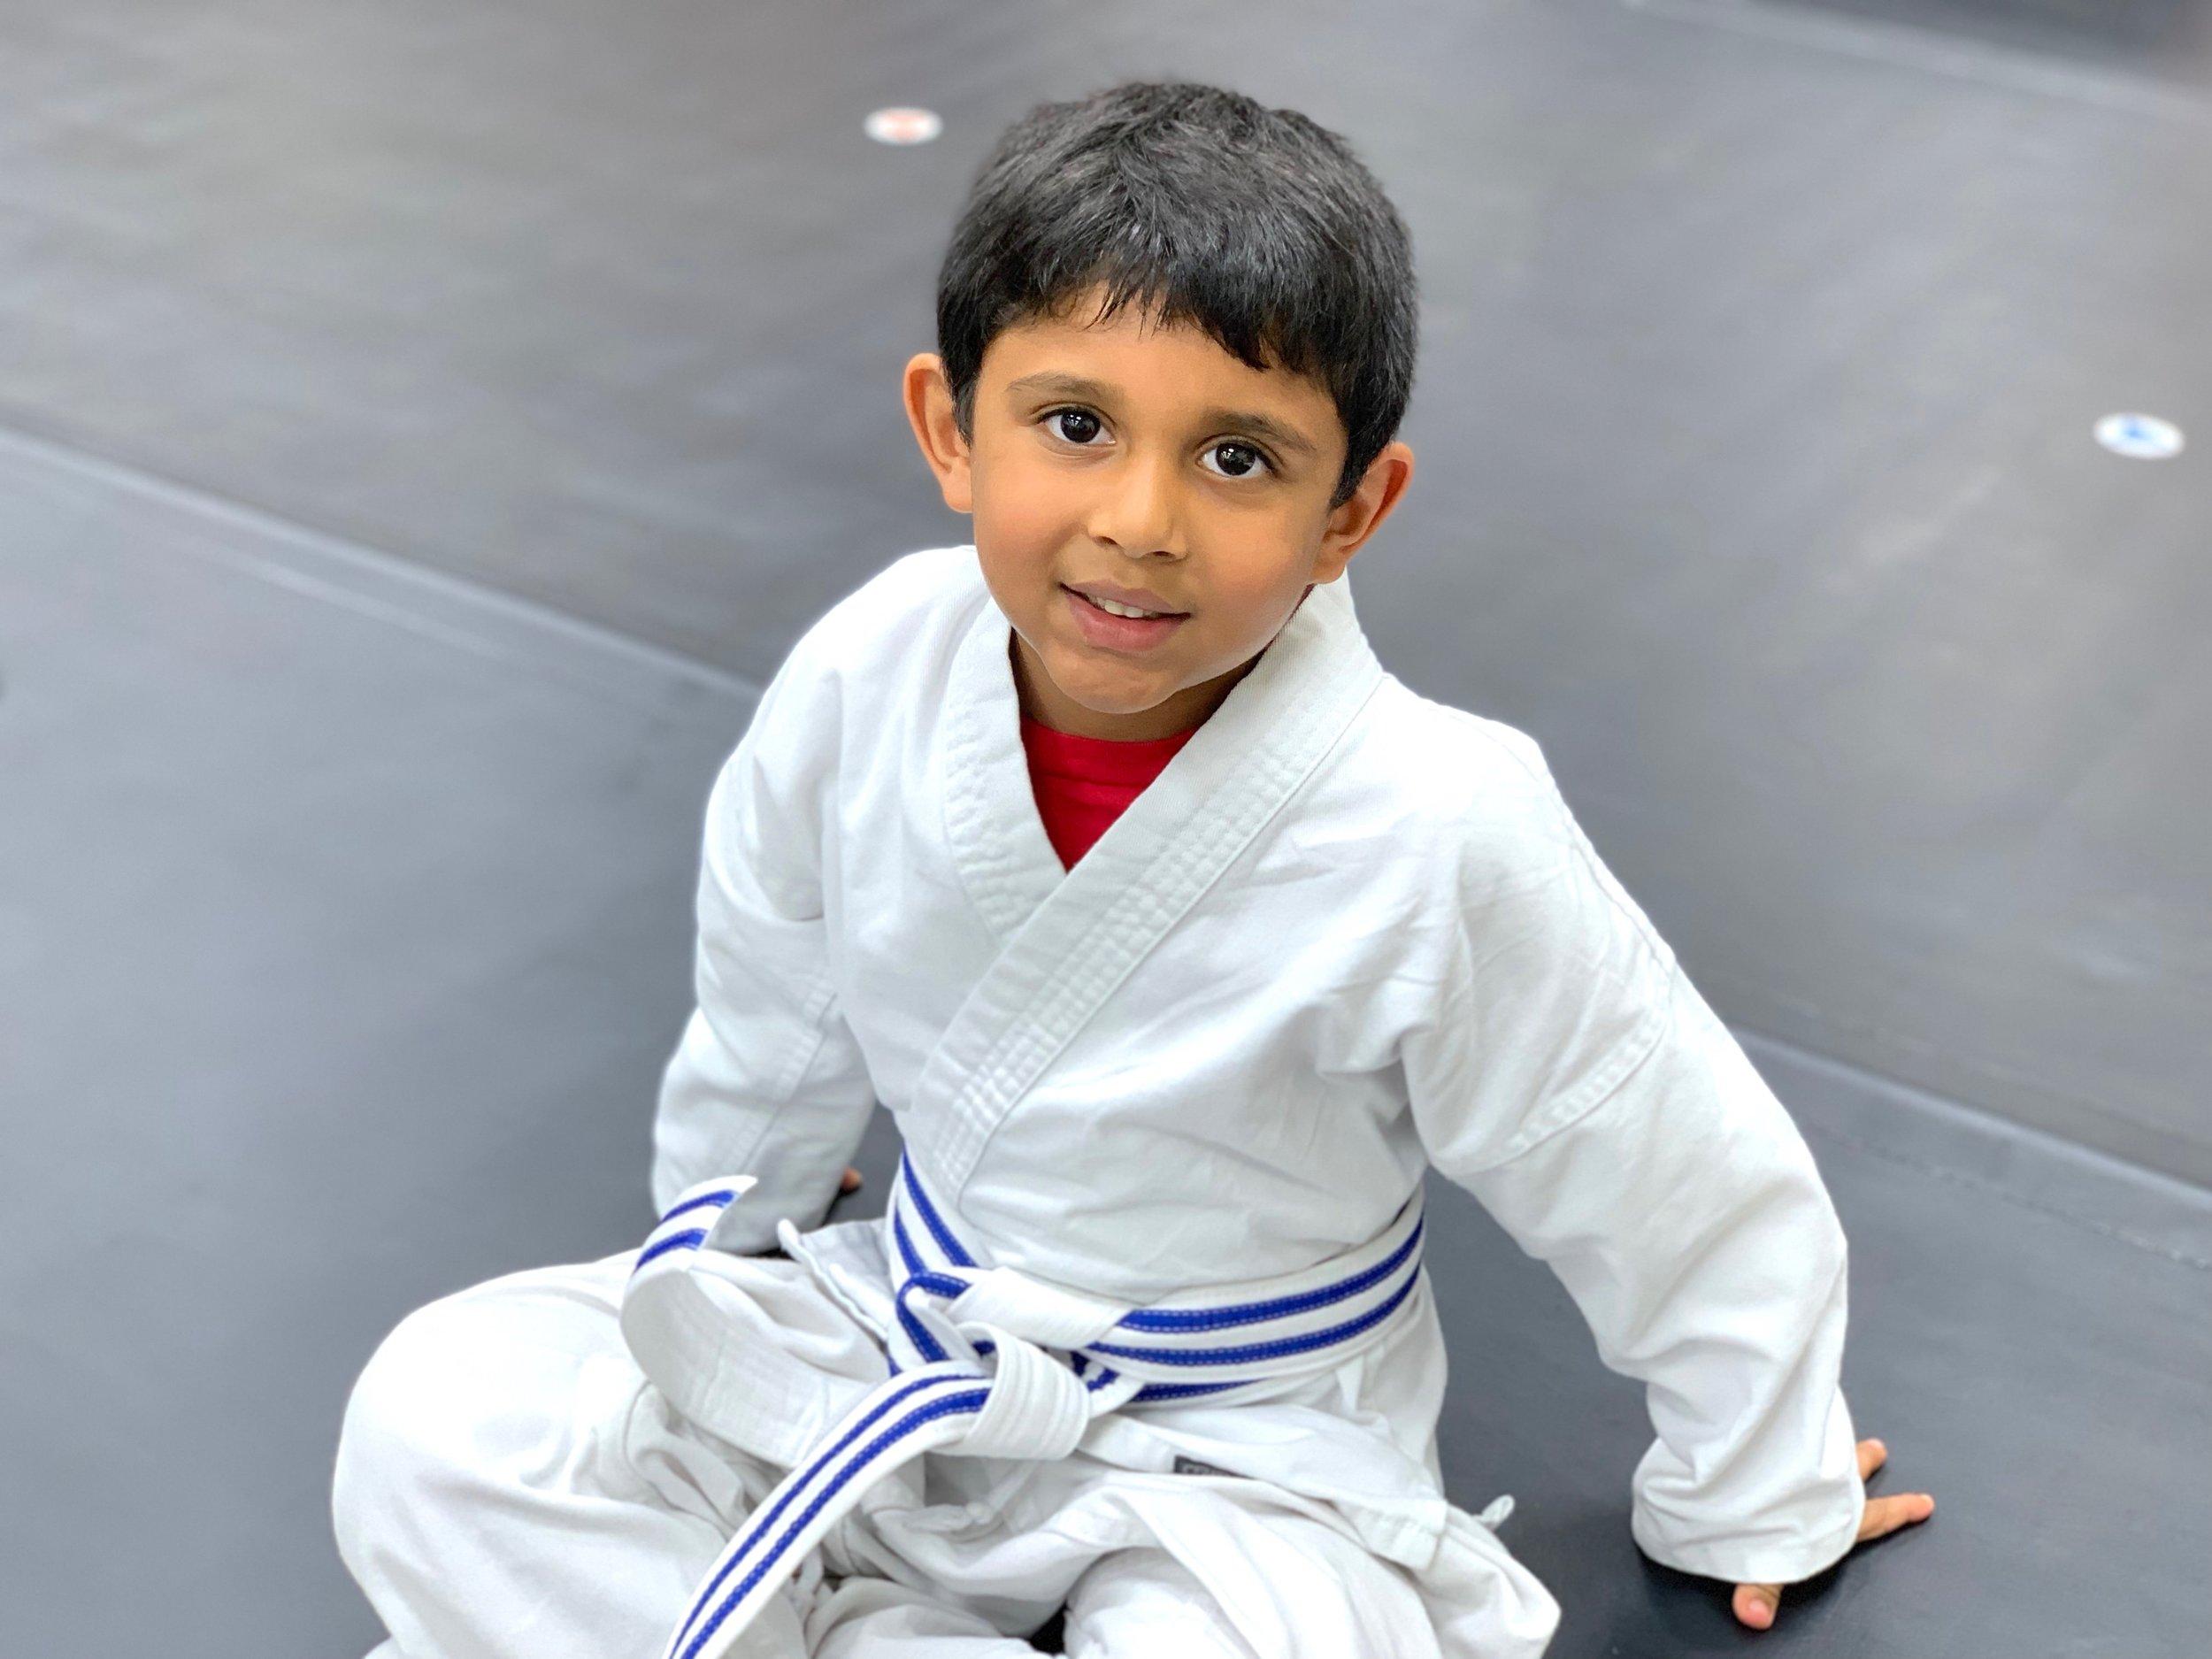 karate-kids-program-souhtlake-keller-grapevine-texas00014.jpeg